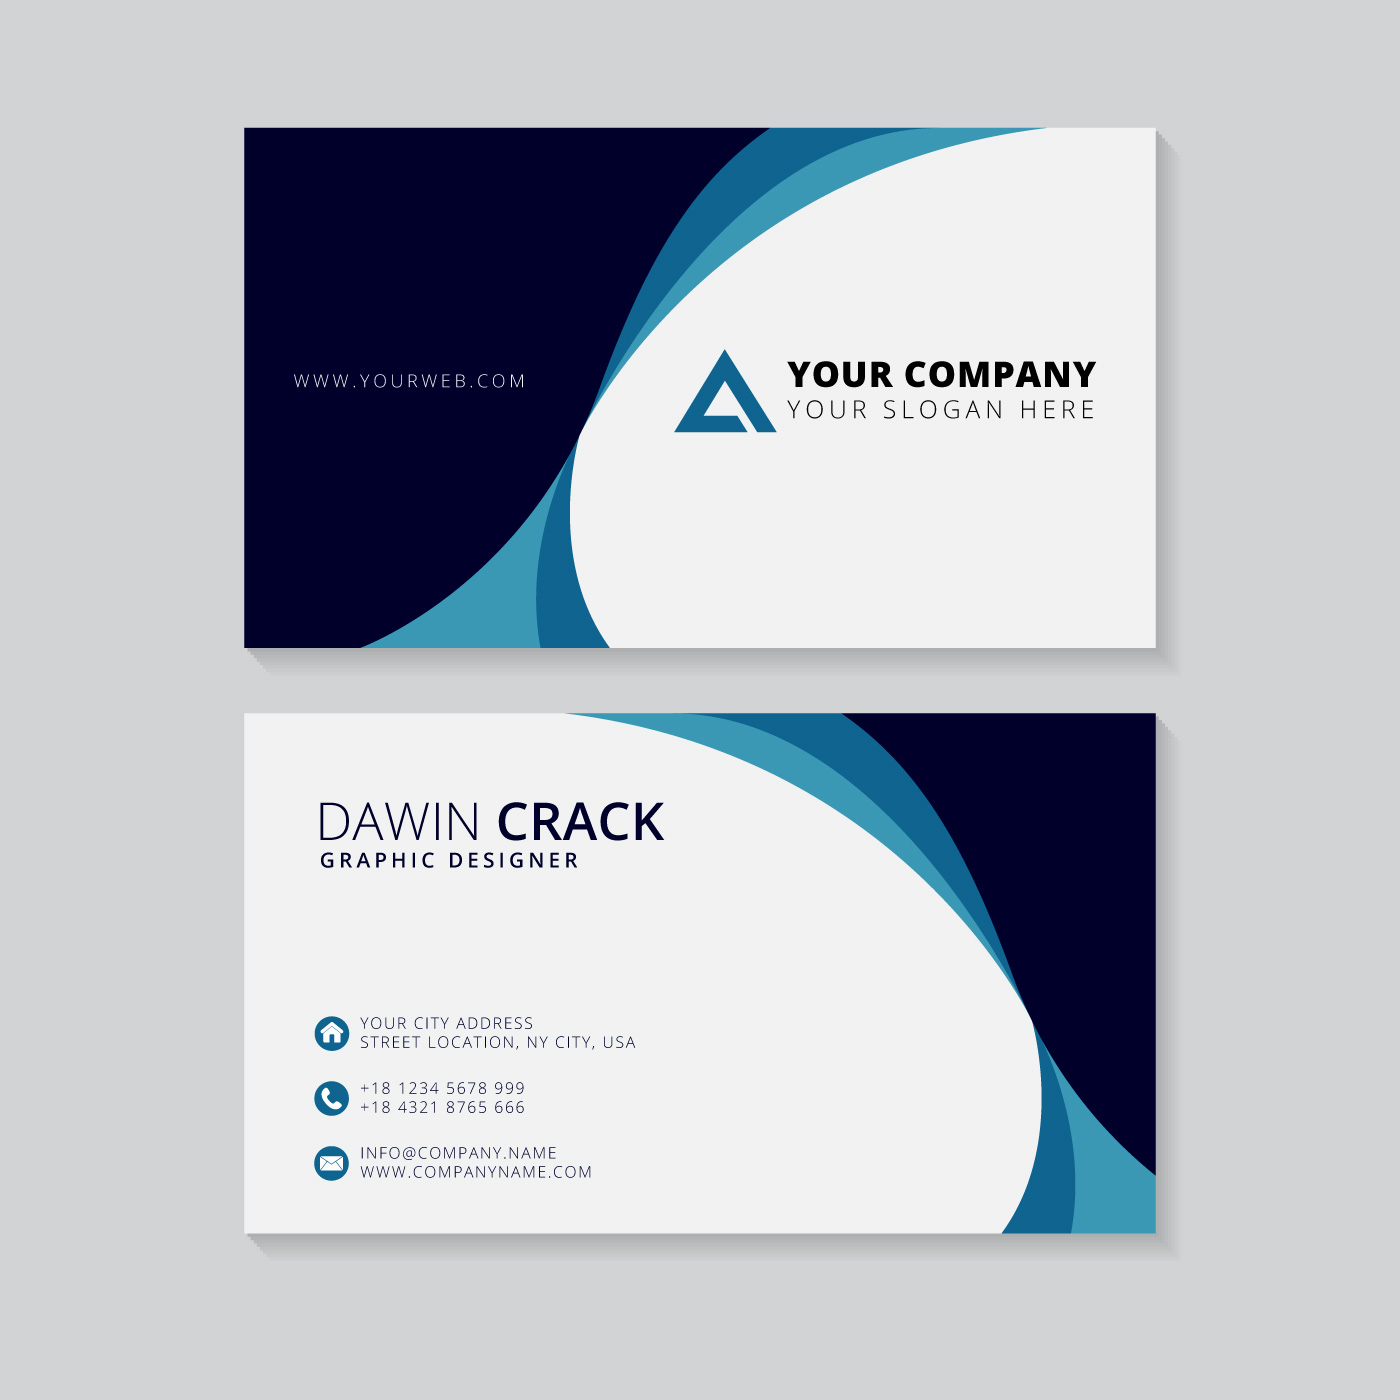 Business Card Template Vector: Creative Business Card Template